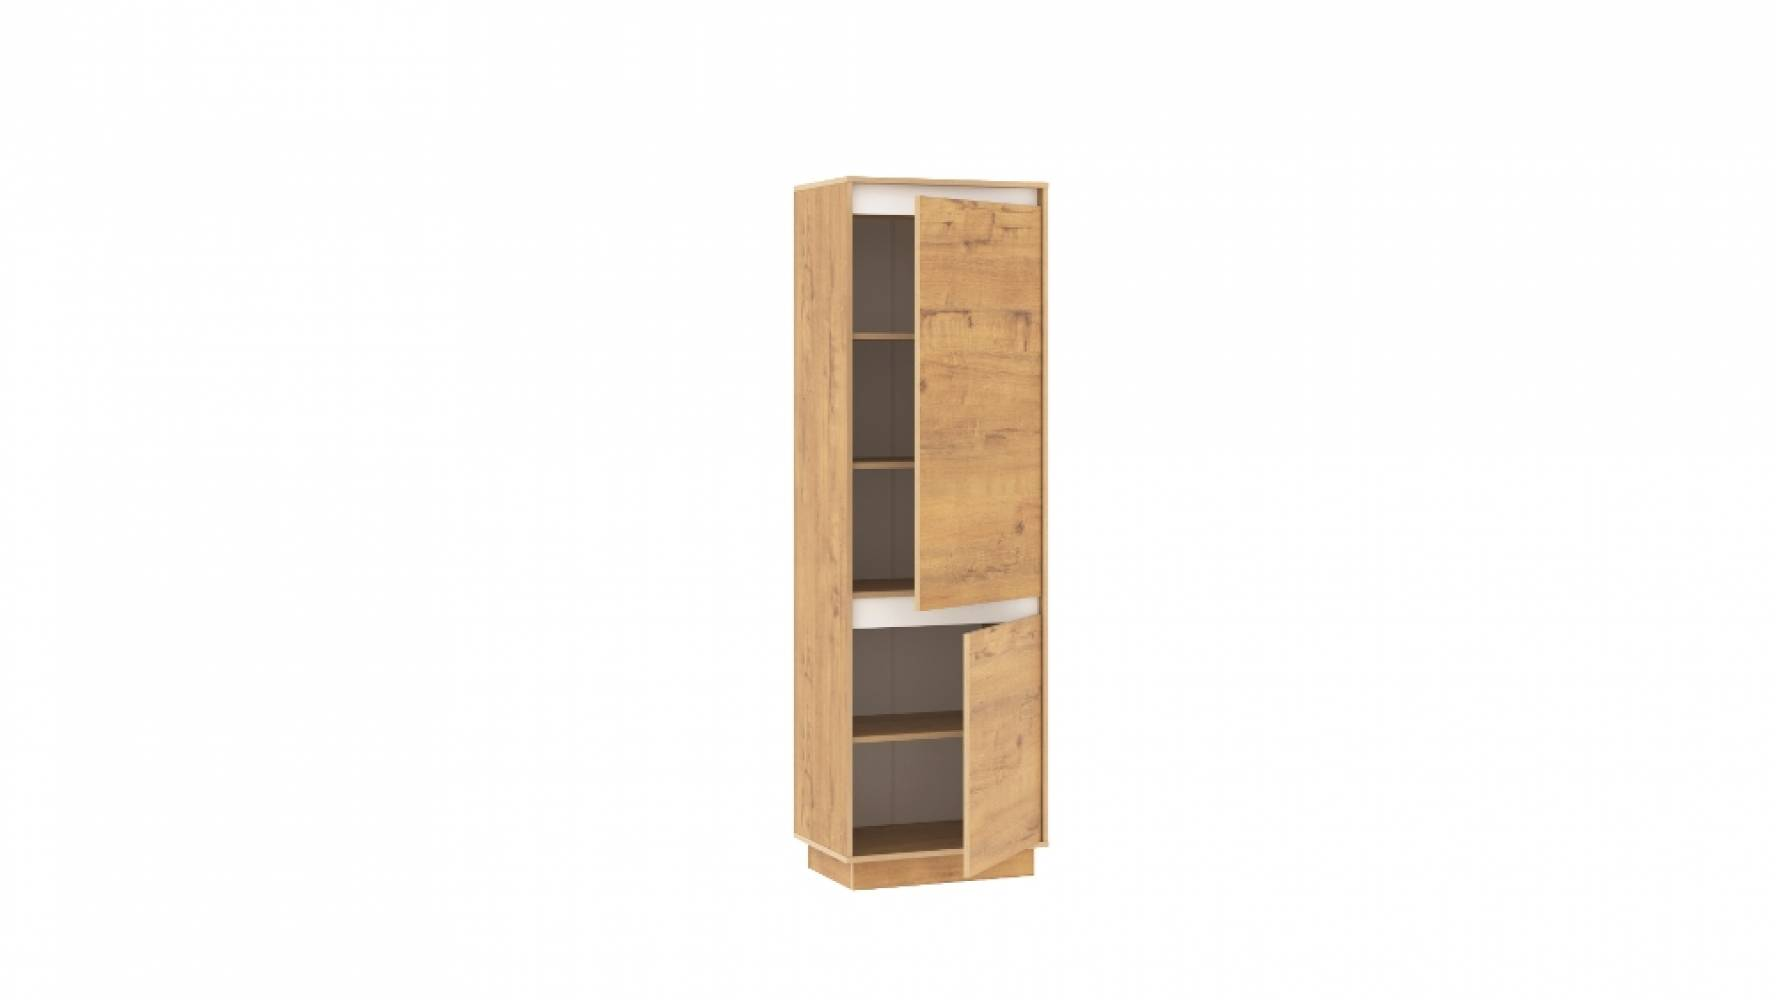 Шкаф для одежды НМ 011.80-01 VIRGINIA (Дуб Бунратти/Белый Скандинавский)